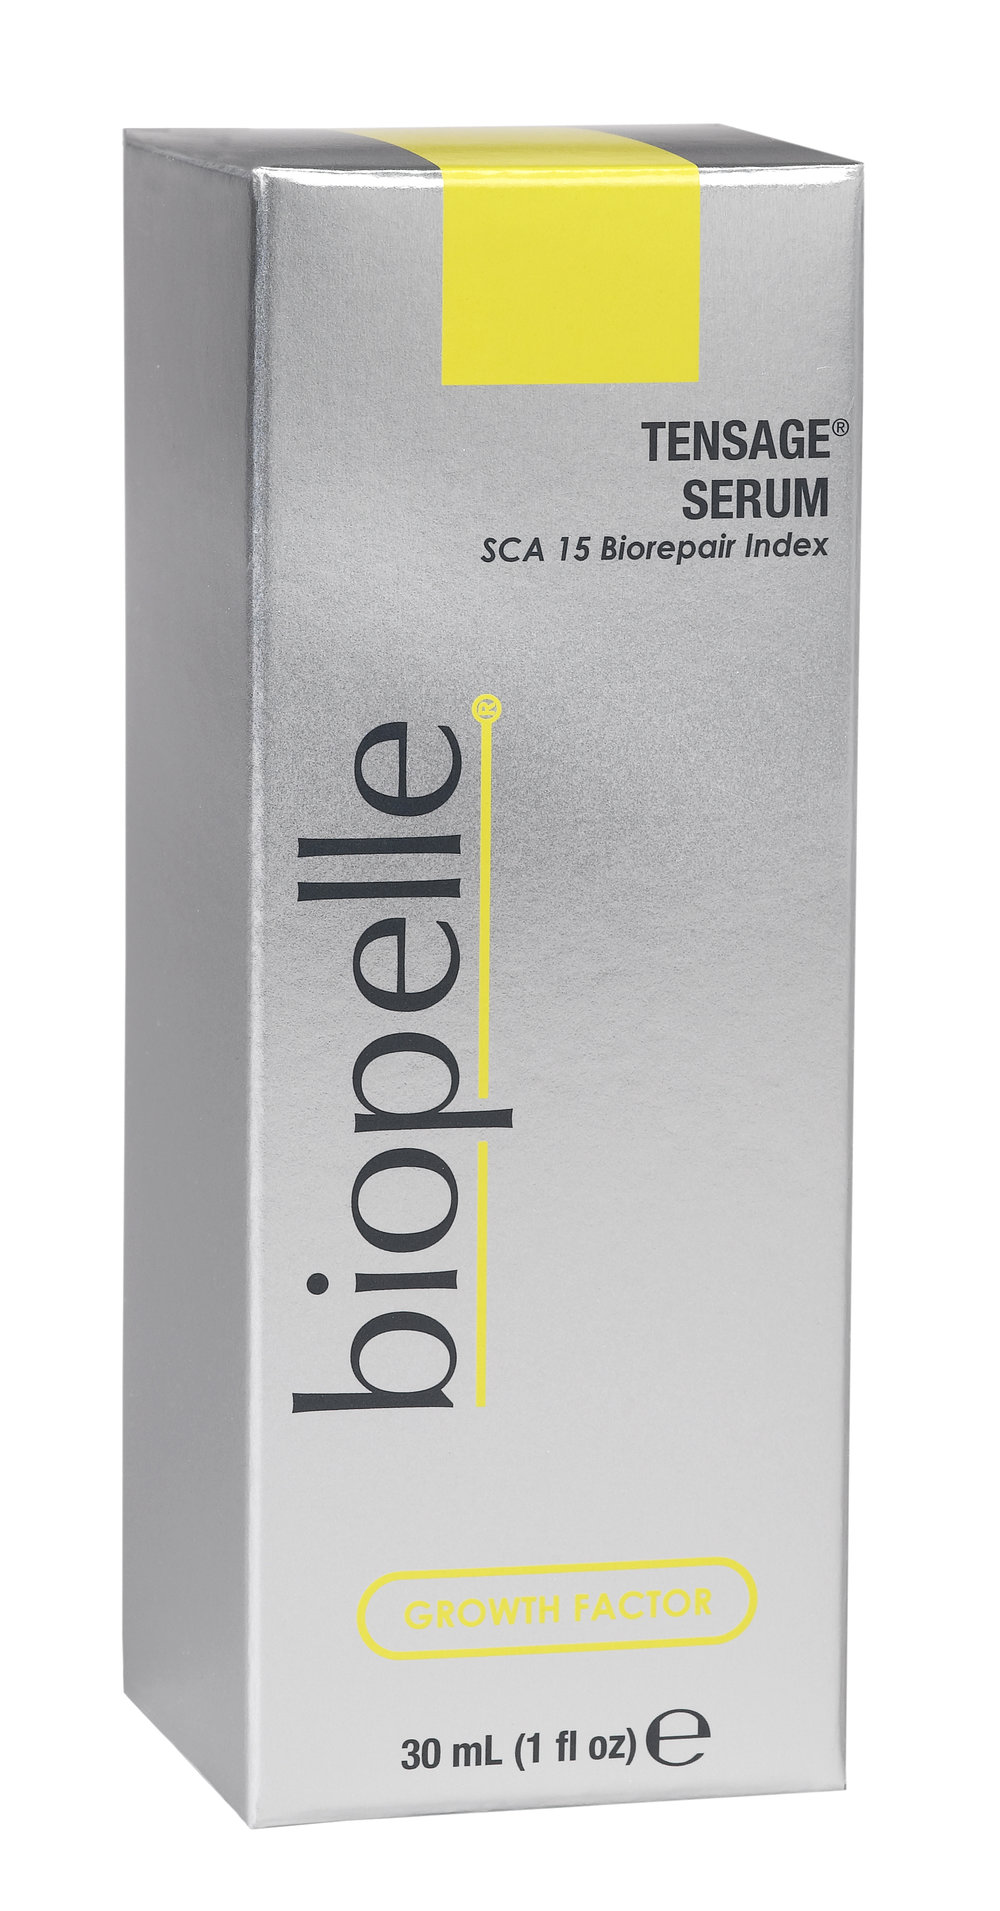 Biopelle  Tensage Serum   Growth factors help repair skin damage and restore elasticity, tone, and texture!